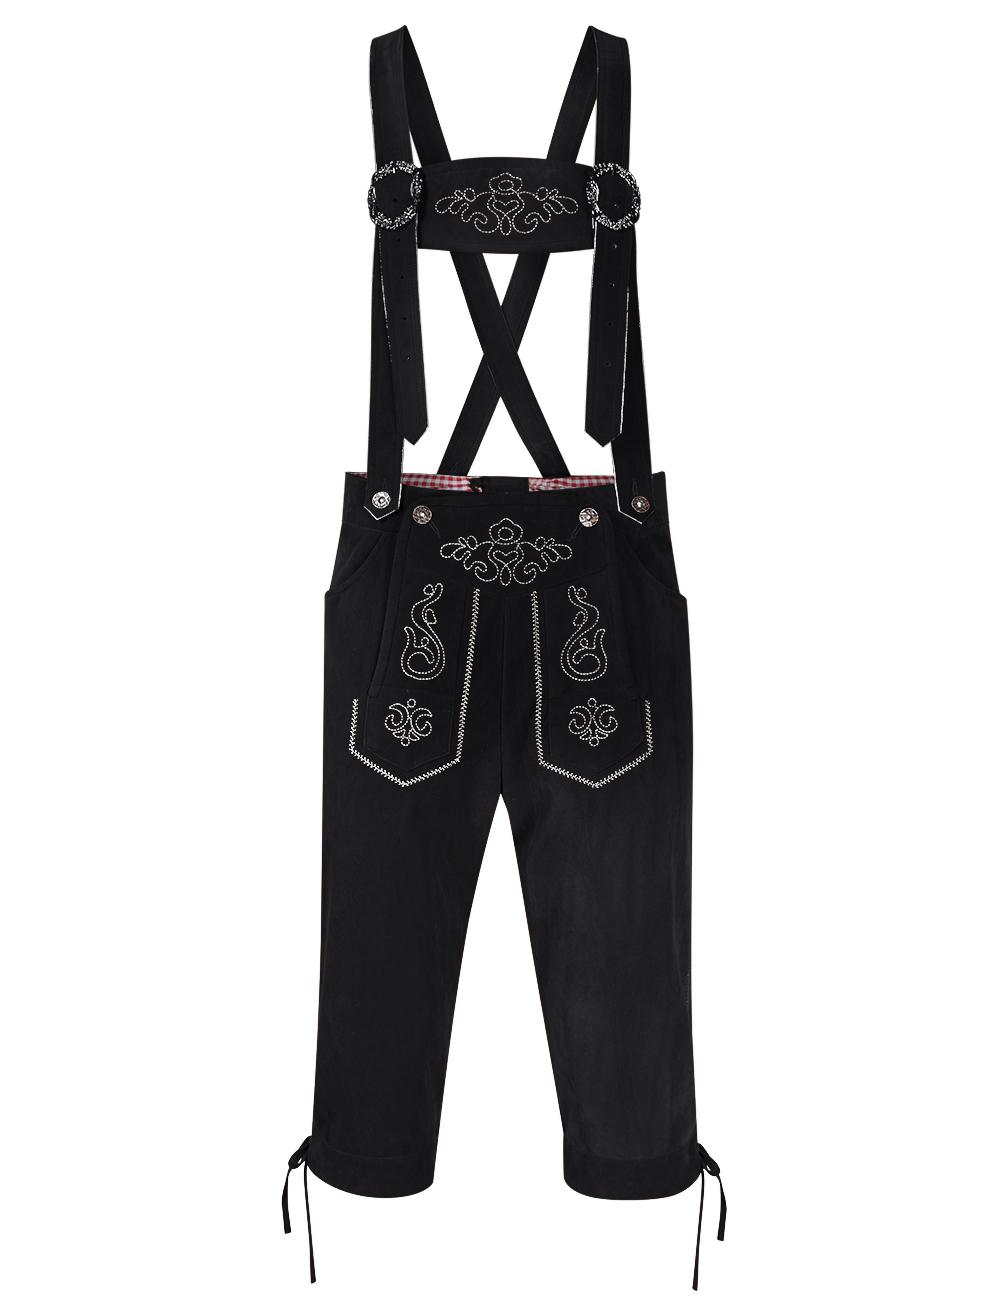 [EU Direct] Men's Oktoberfest Stylish Embroidery Party Dress Pants Vintage Faux Fleece Strap Midi Pants